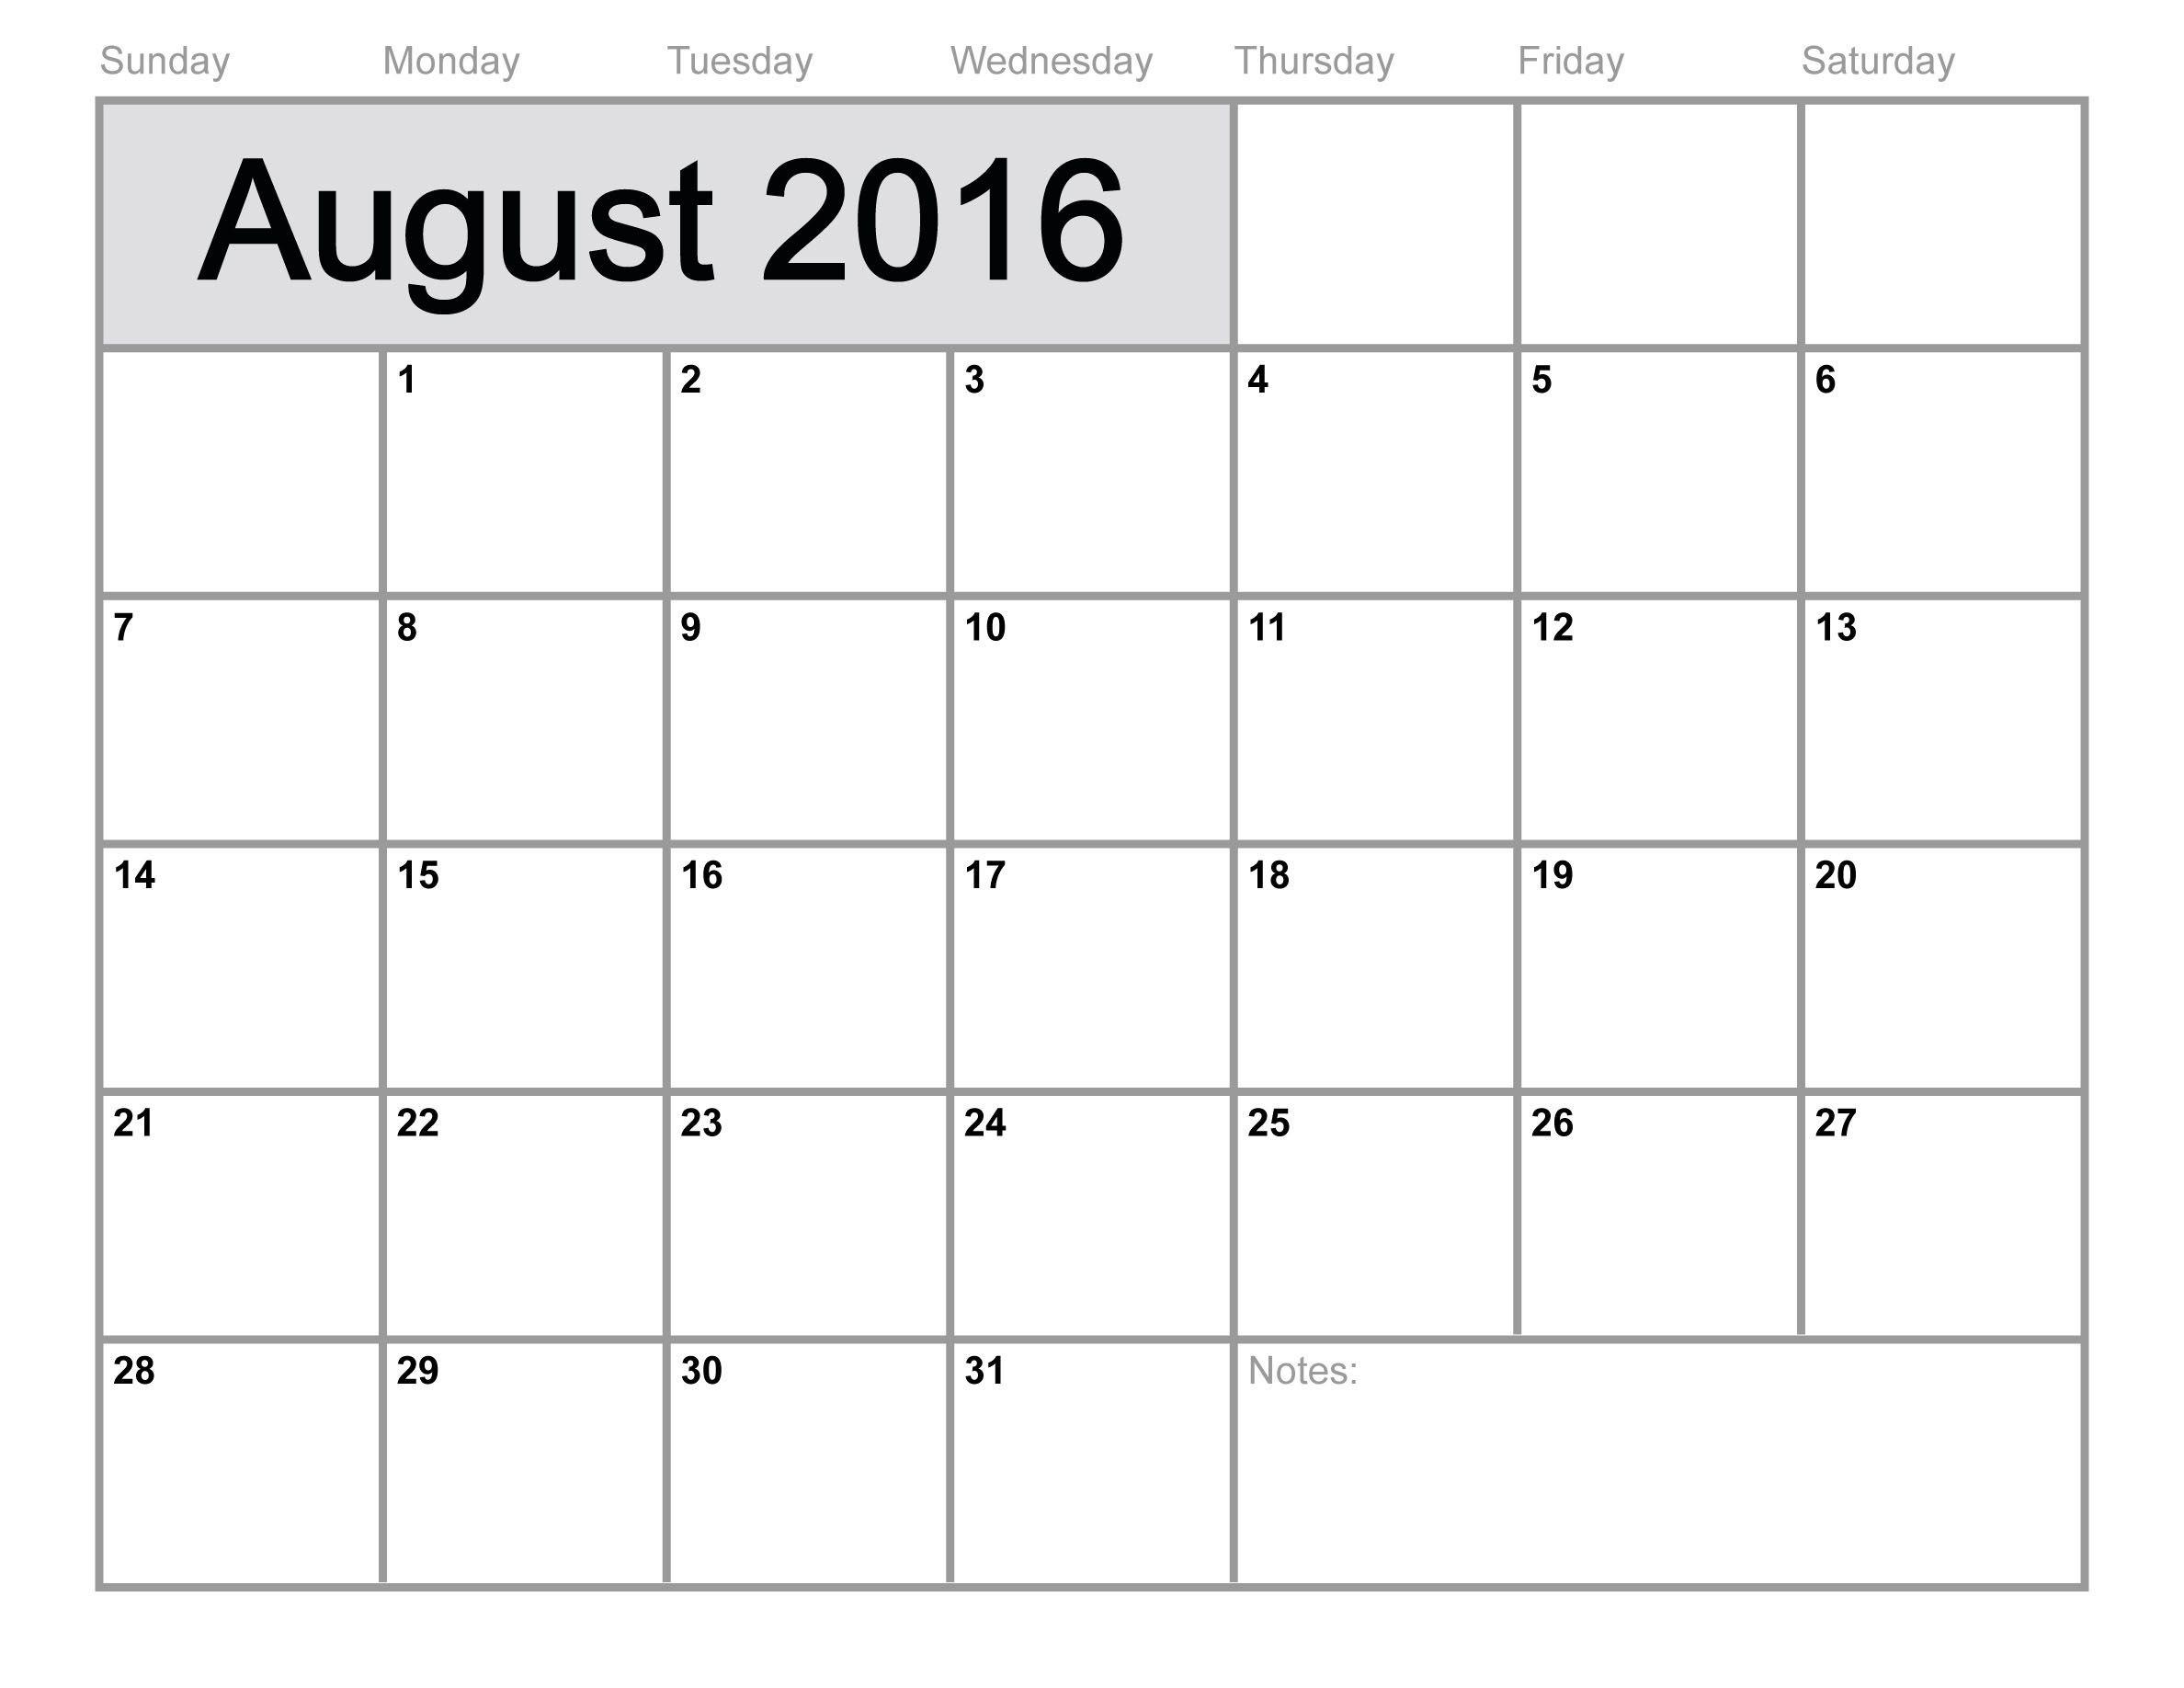 Remarkable Calendar Blank On Ipad • Printable Blank Calendar Template_Calendar Blank On Ipad